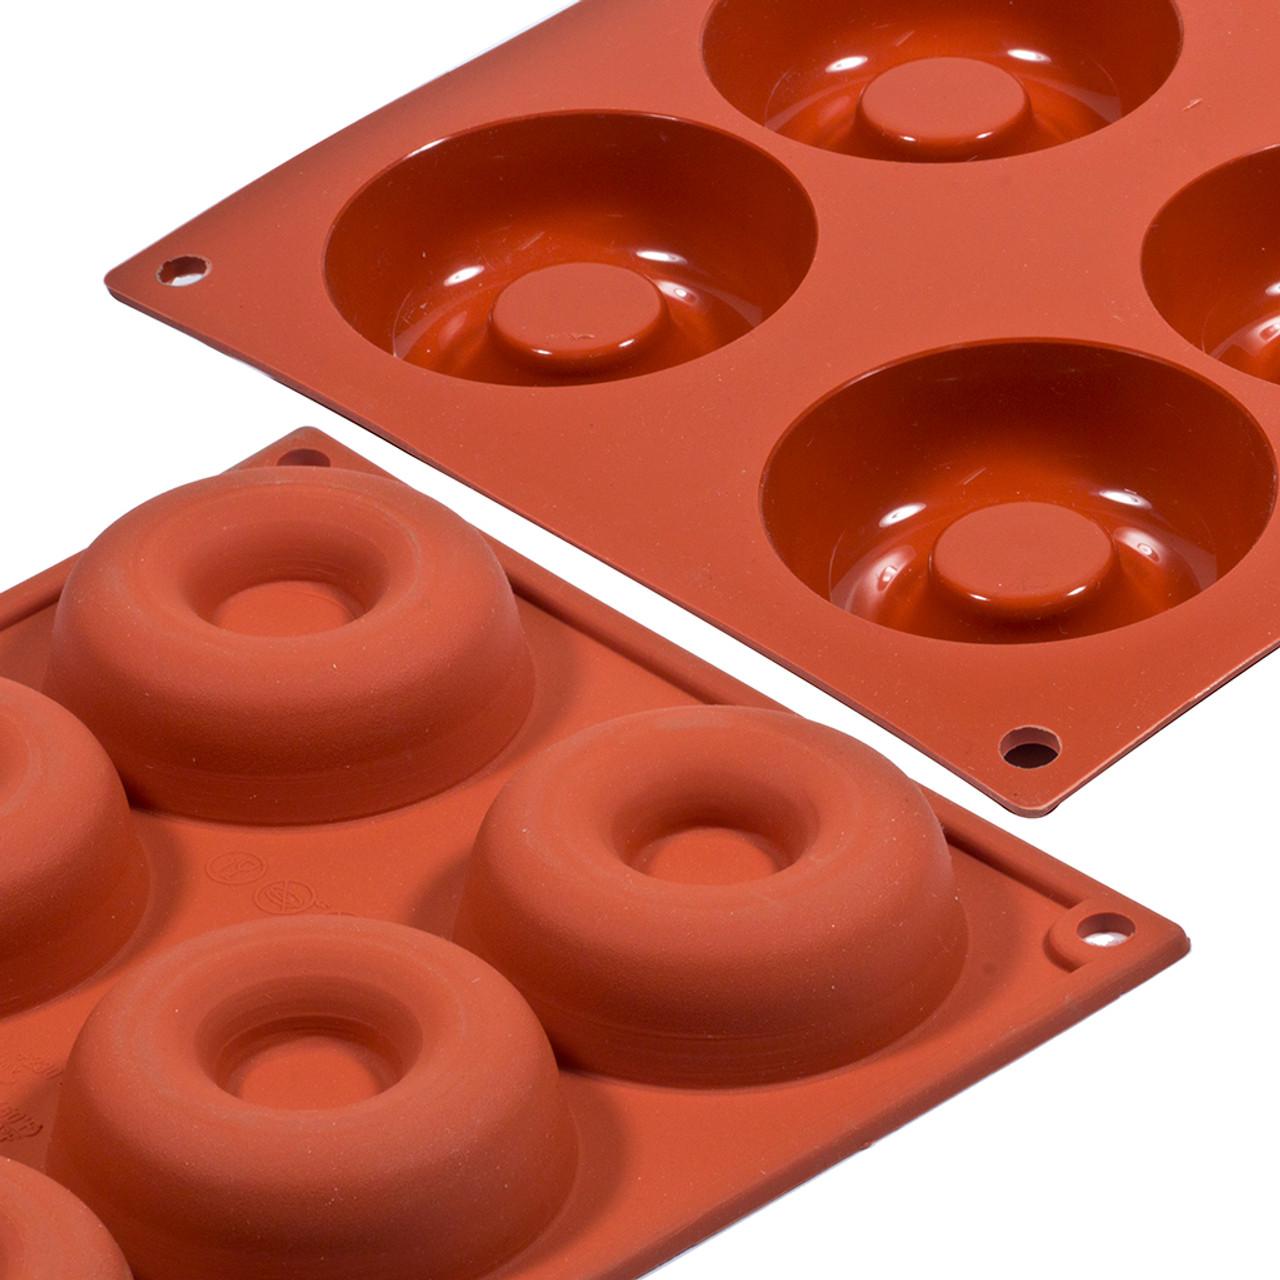 Silicon Mould - Savarin x 8's